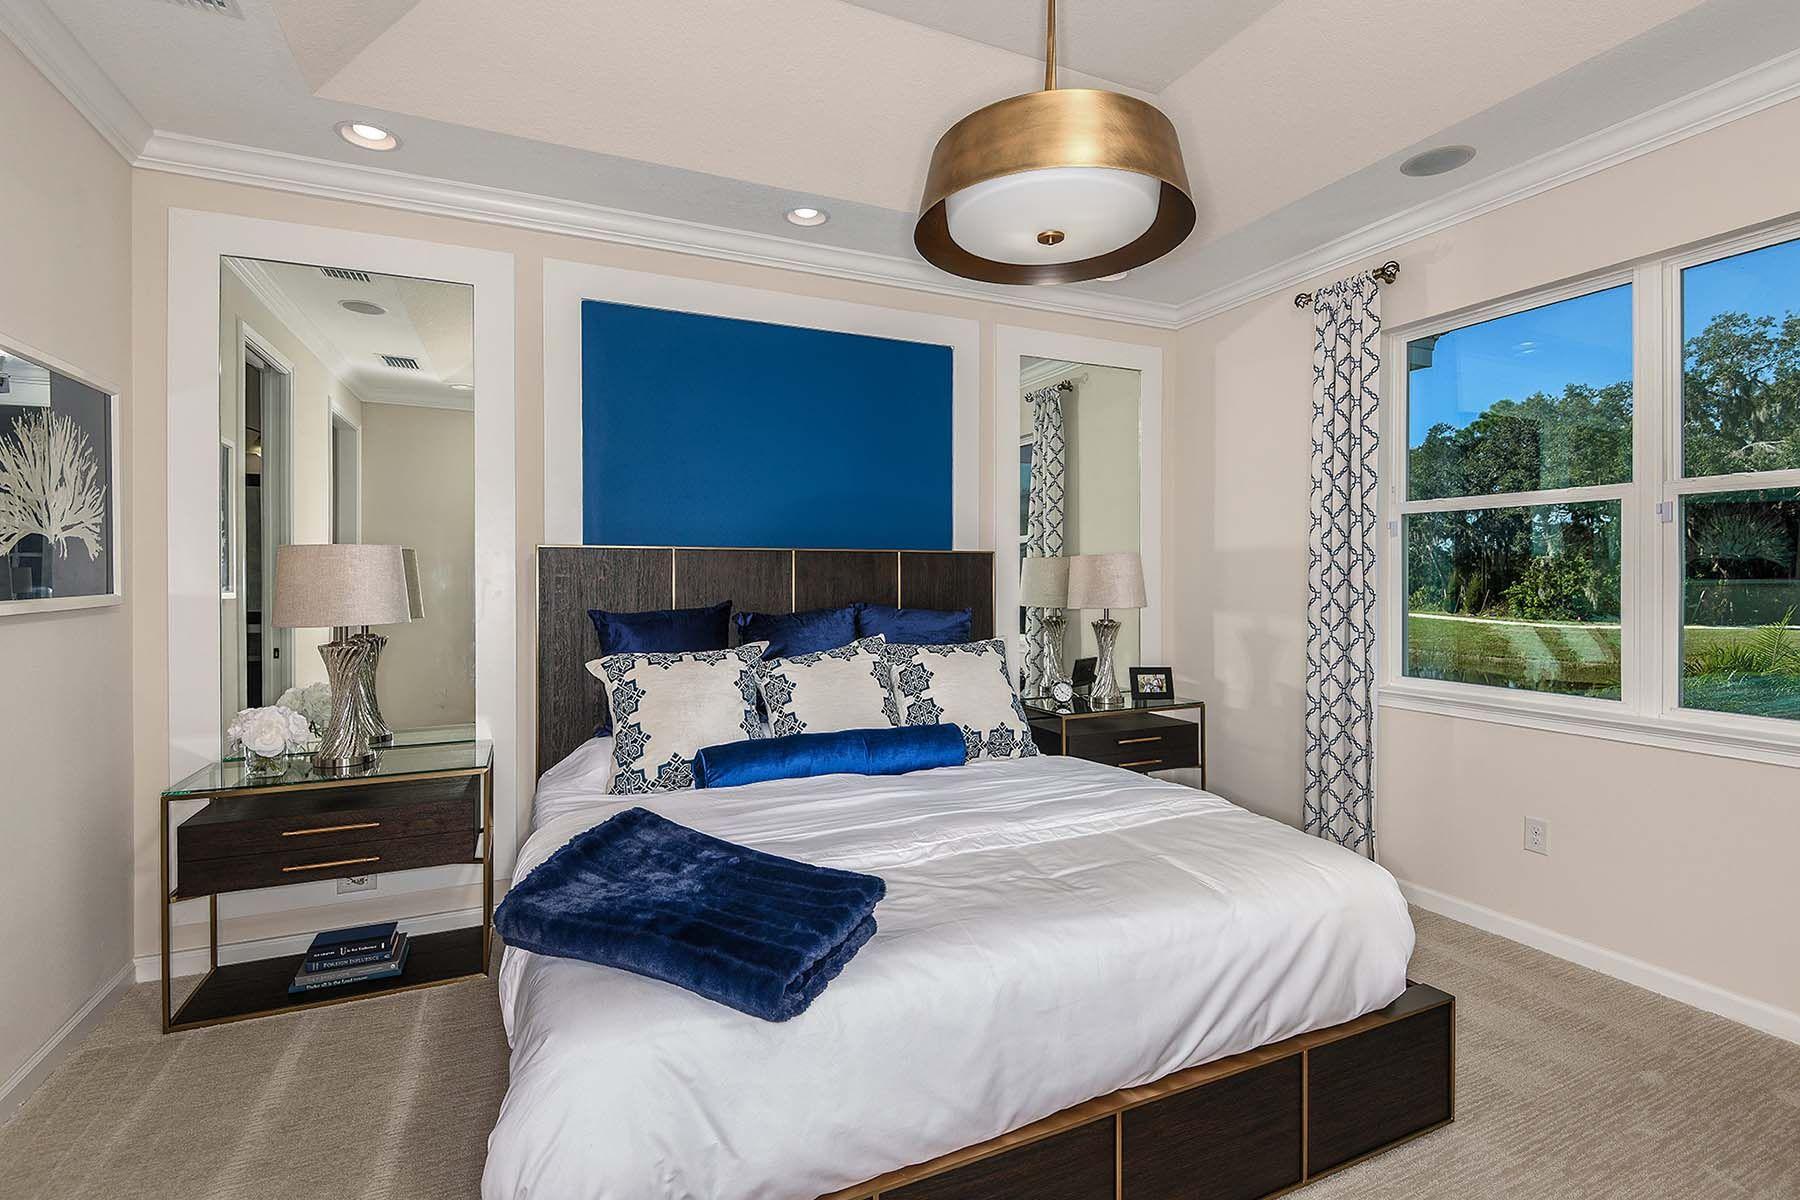 Bedroom featured in the Bayport By Mattamy Homes in Sarasota-Bradenton, FL